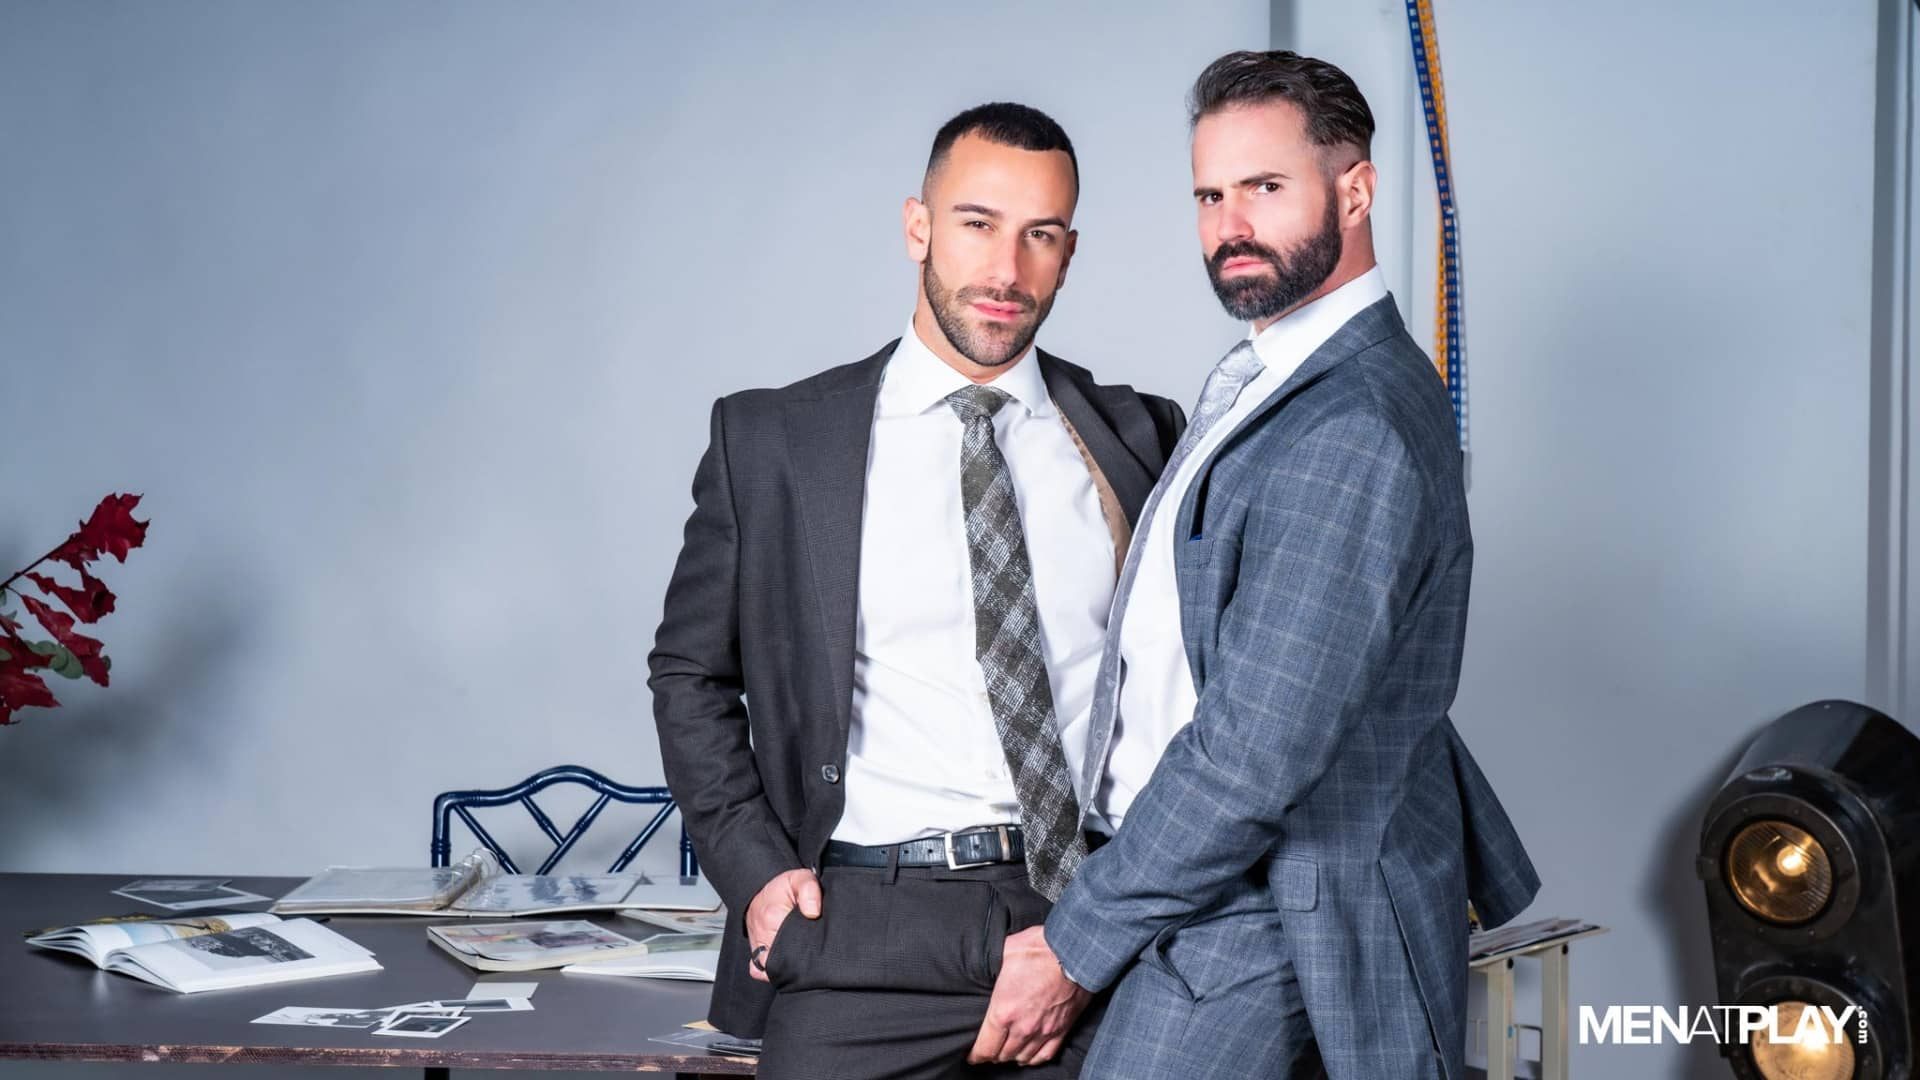 Servicing The Boss – Dani Robles and Gustavo Cruz